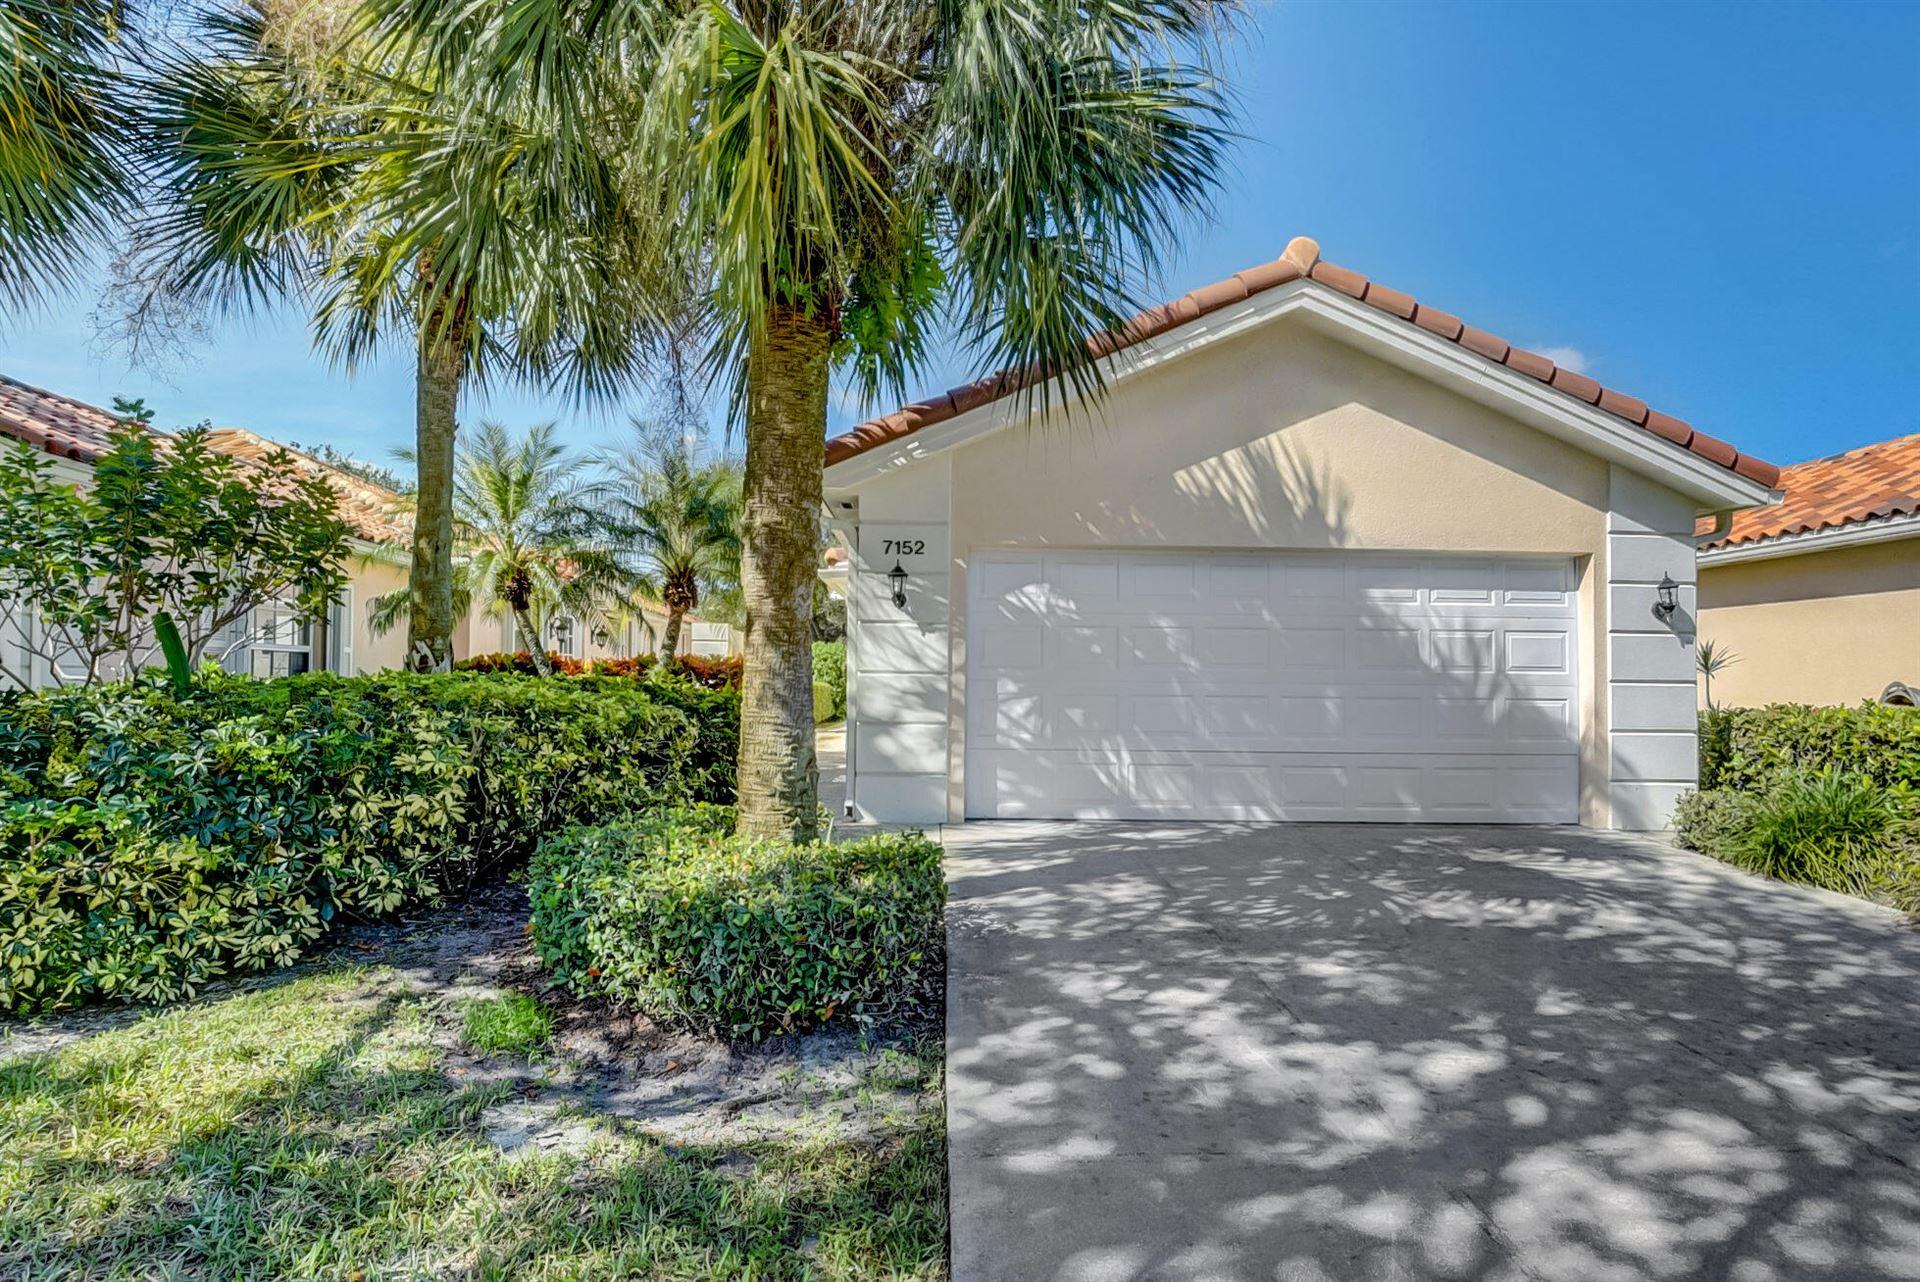 7152 Grassy Bay Drive, West Palm Beach, FL 33411 - MLS#: RX-10753165